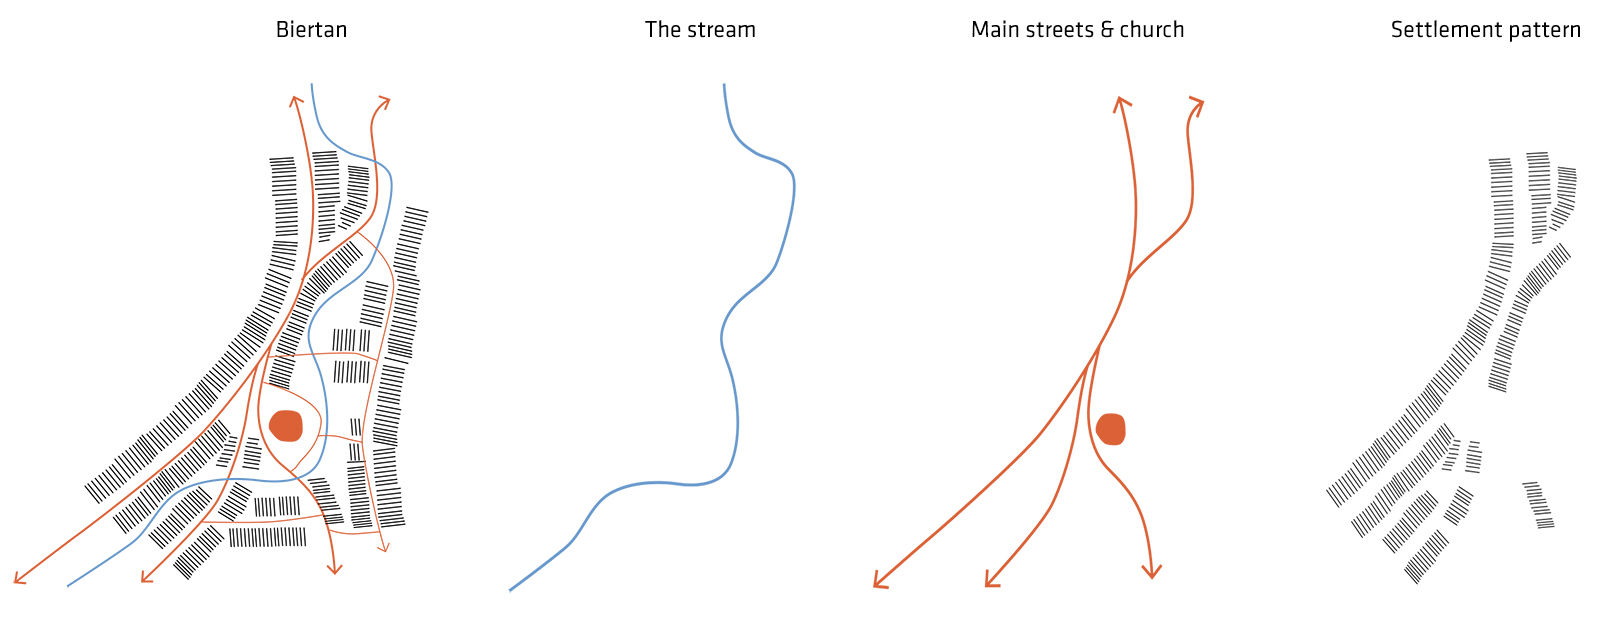 Biertan, settlement pattern